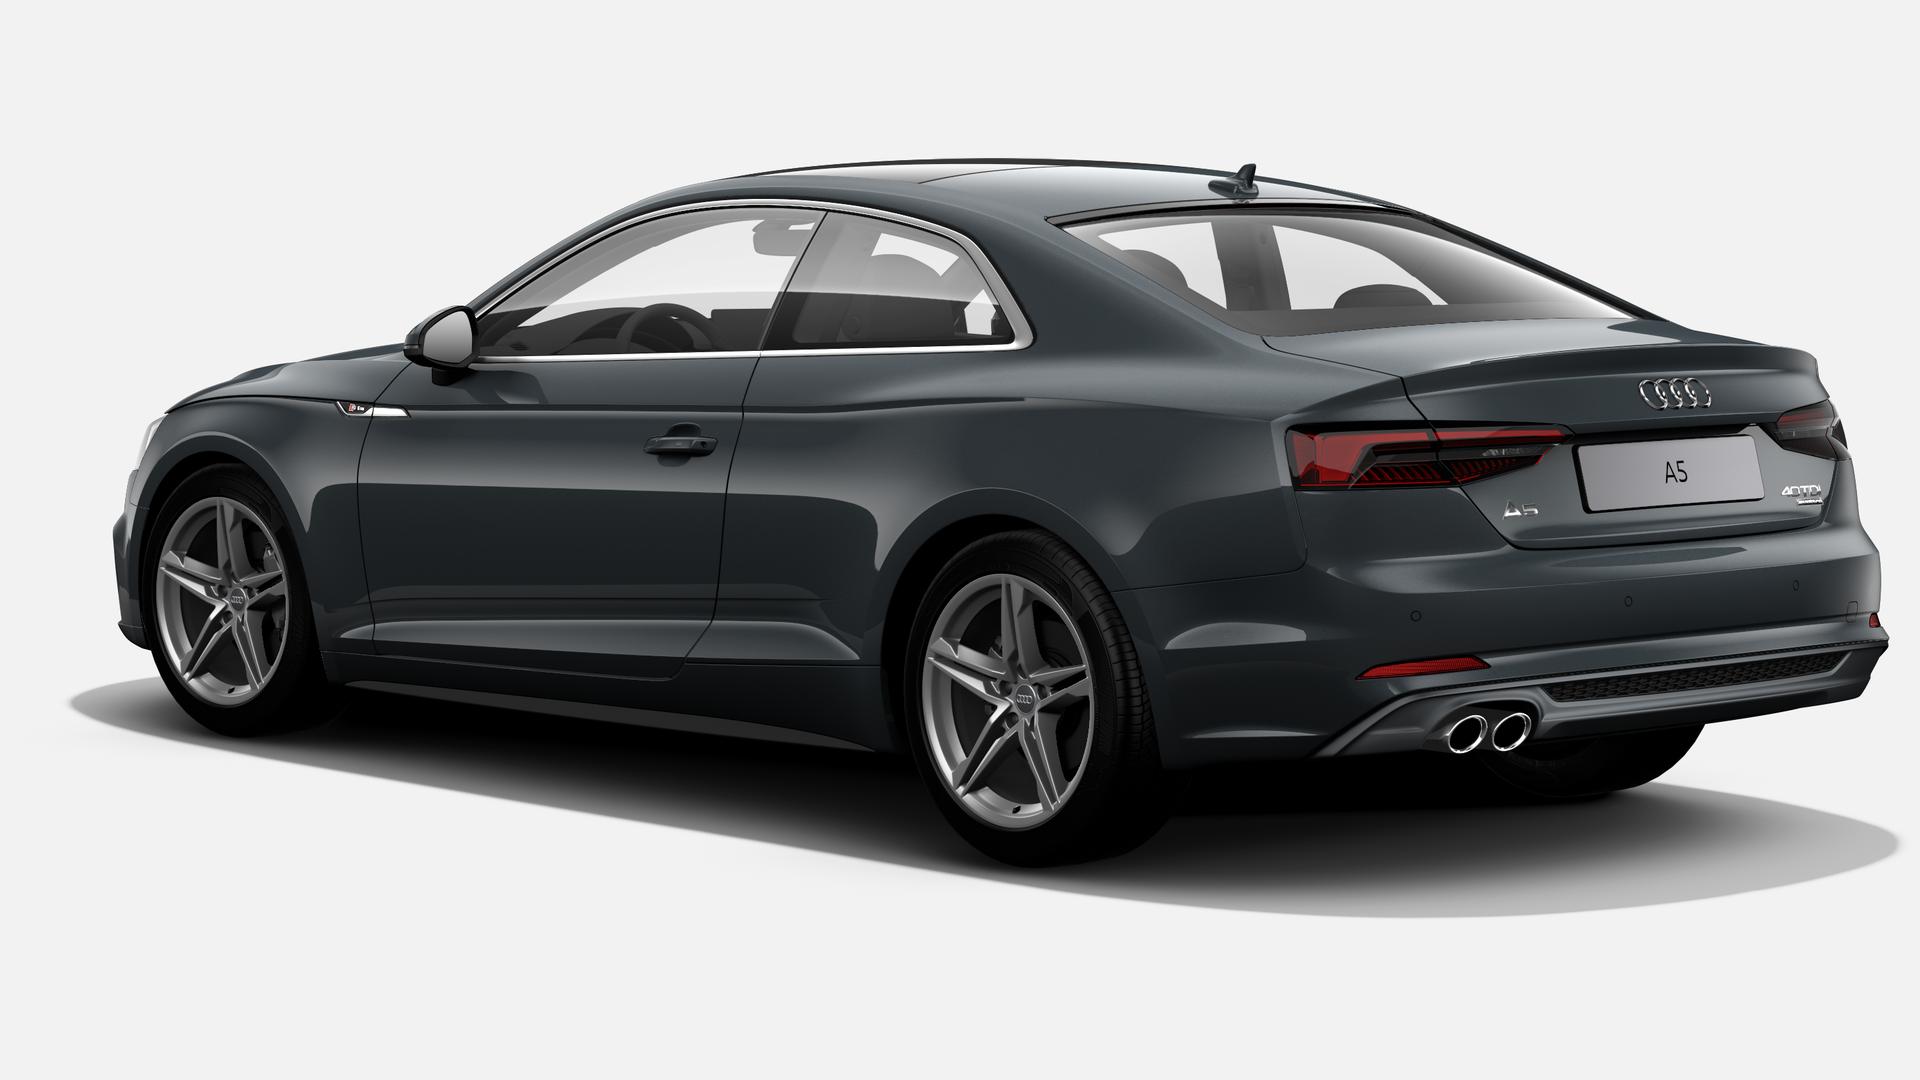 Vista Tres cuartos trasera izquierda de Audi A5 Coupe 40 TDI S line quattro S tronic 140 kW (190 CV)